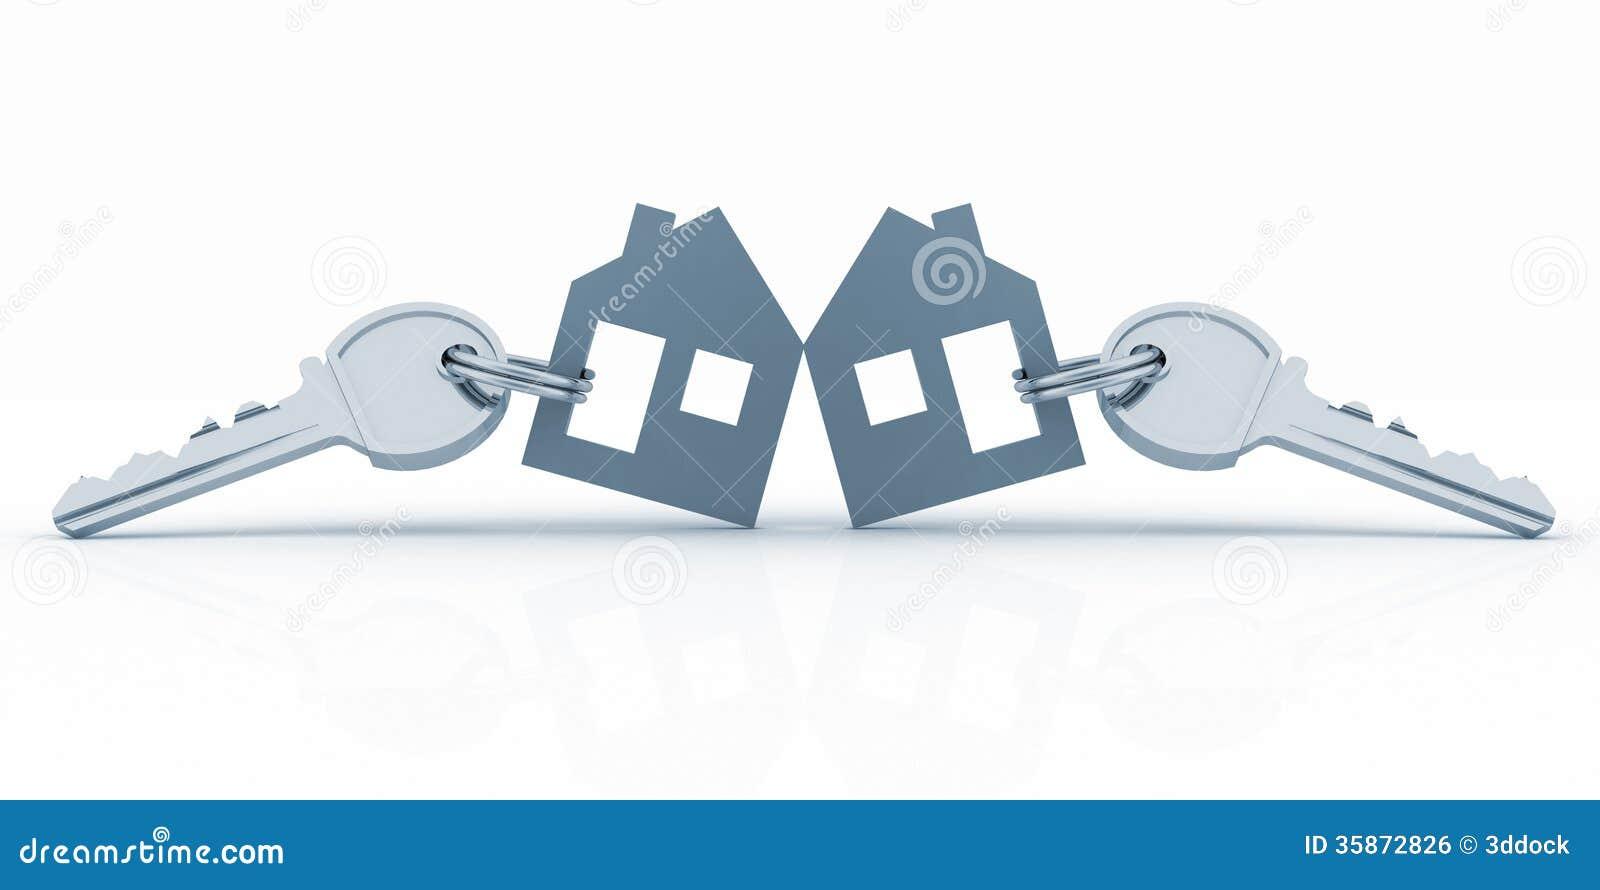 Model houses with keys stock illustration. Illustration of ...